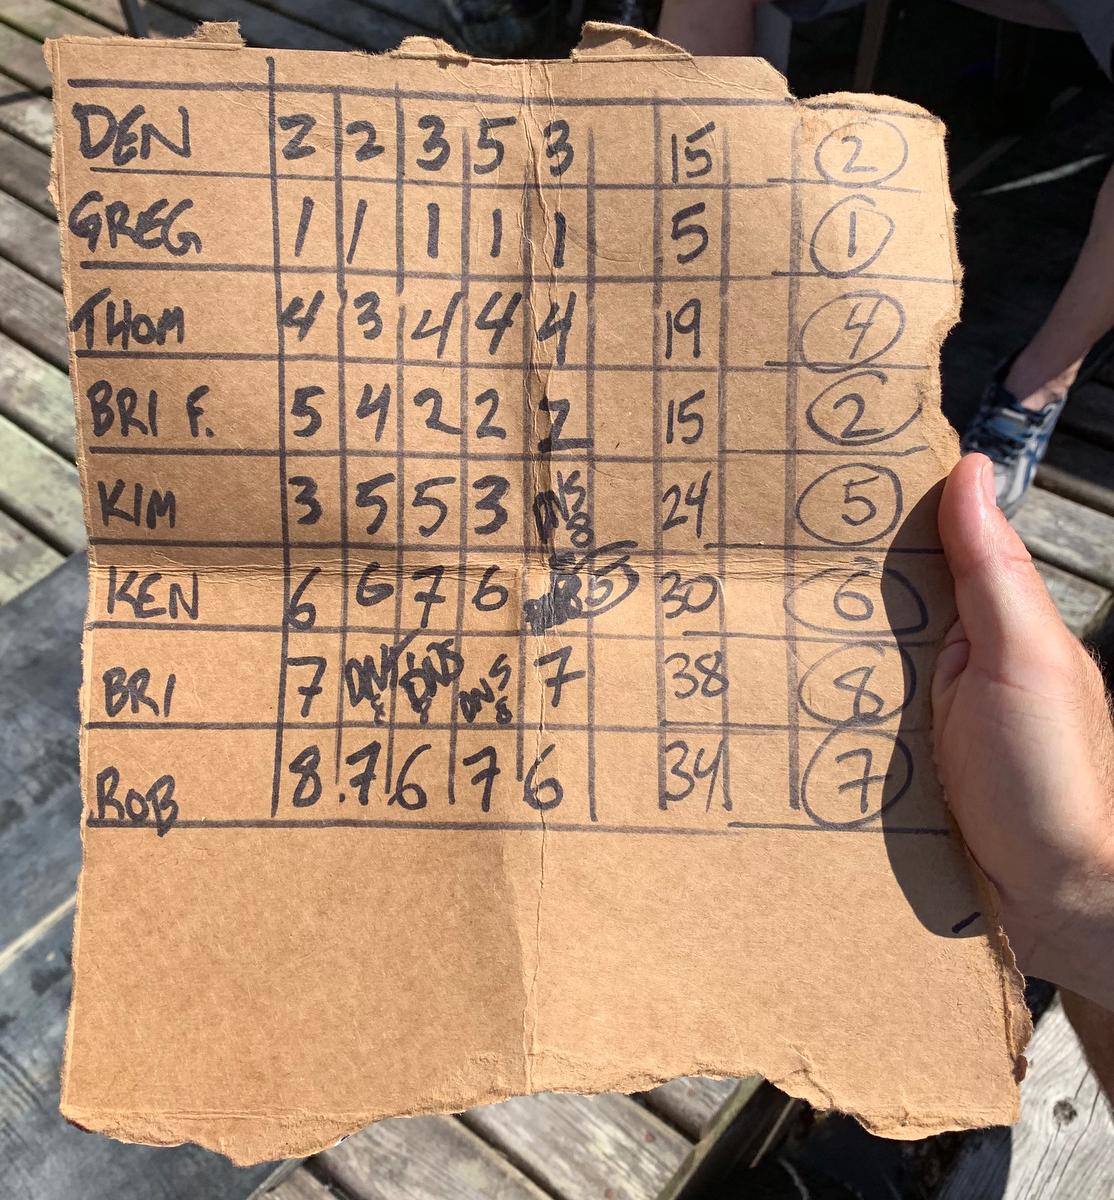 The scores from the 2019 Poise Cove Regatta.